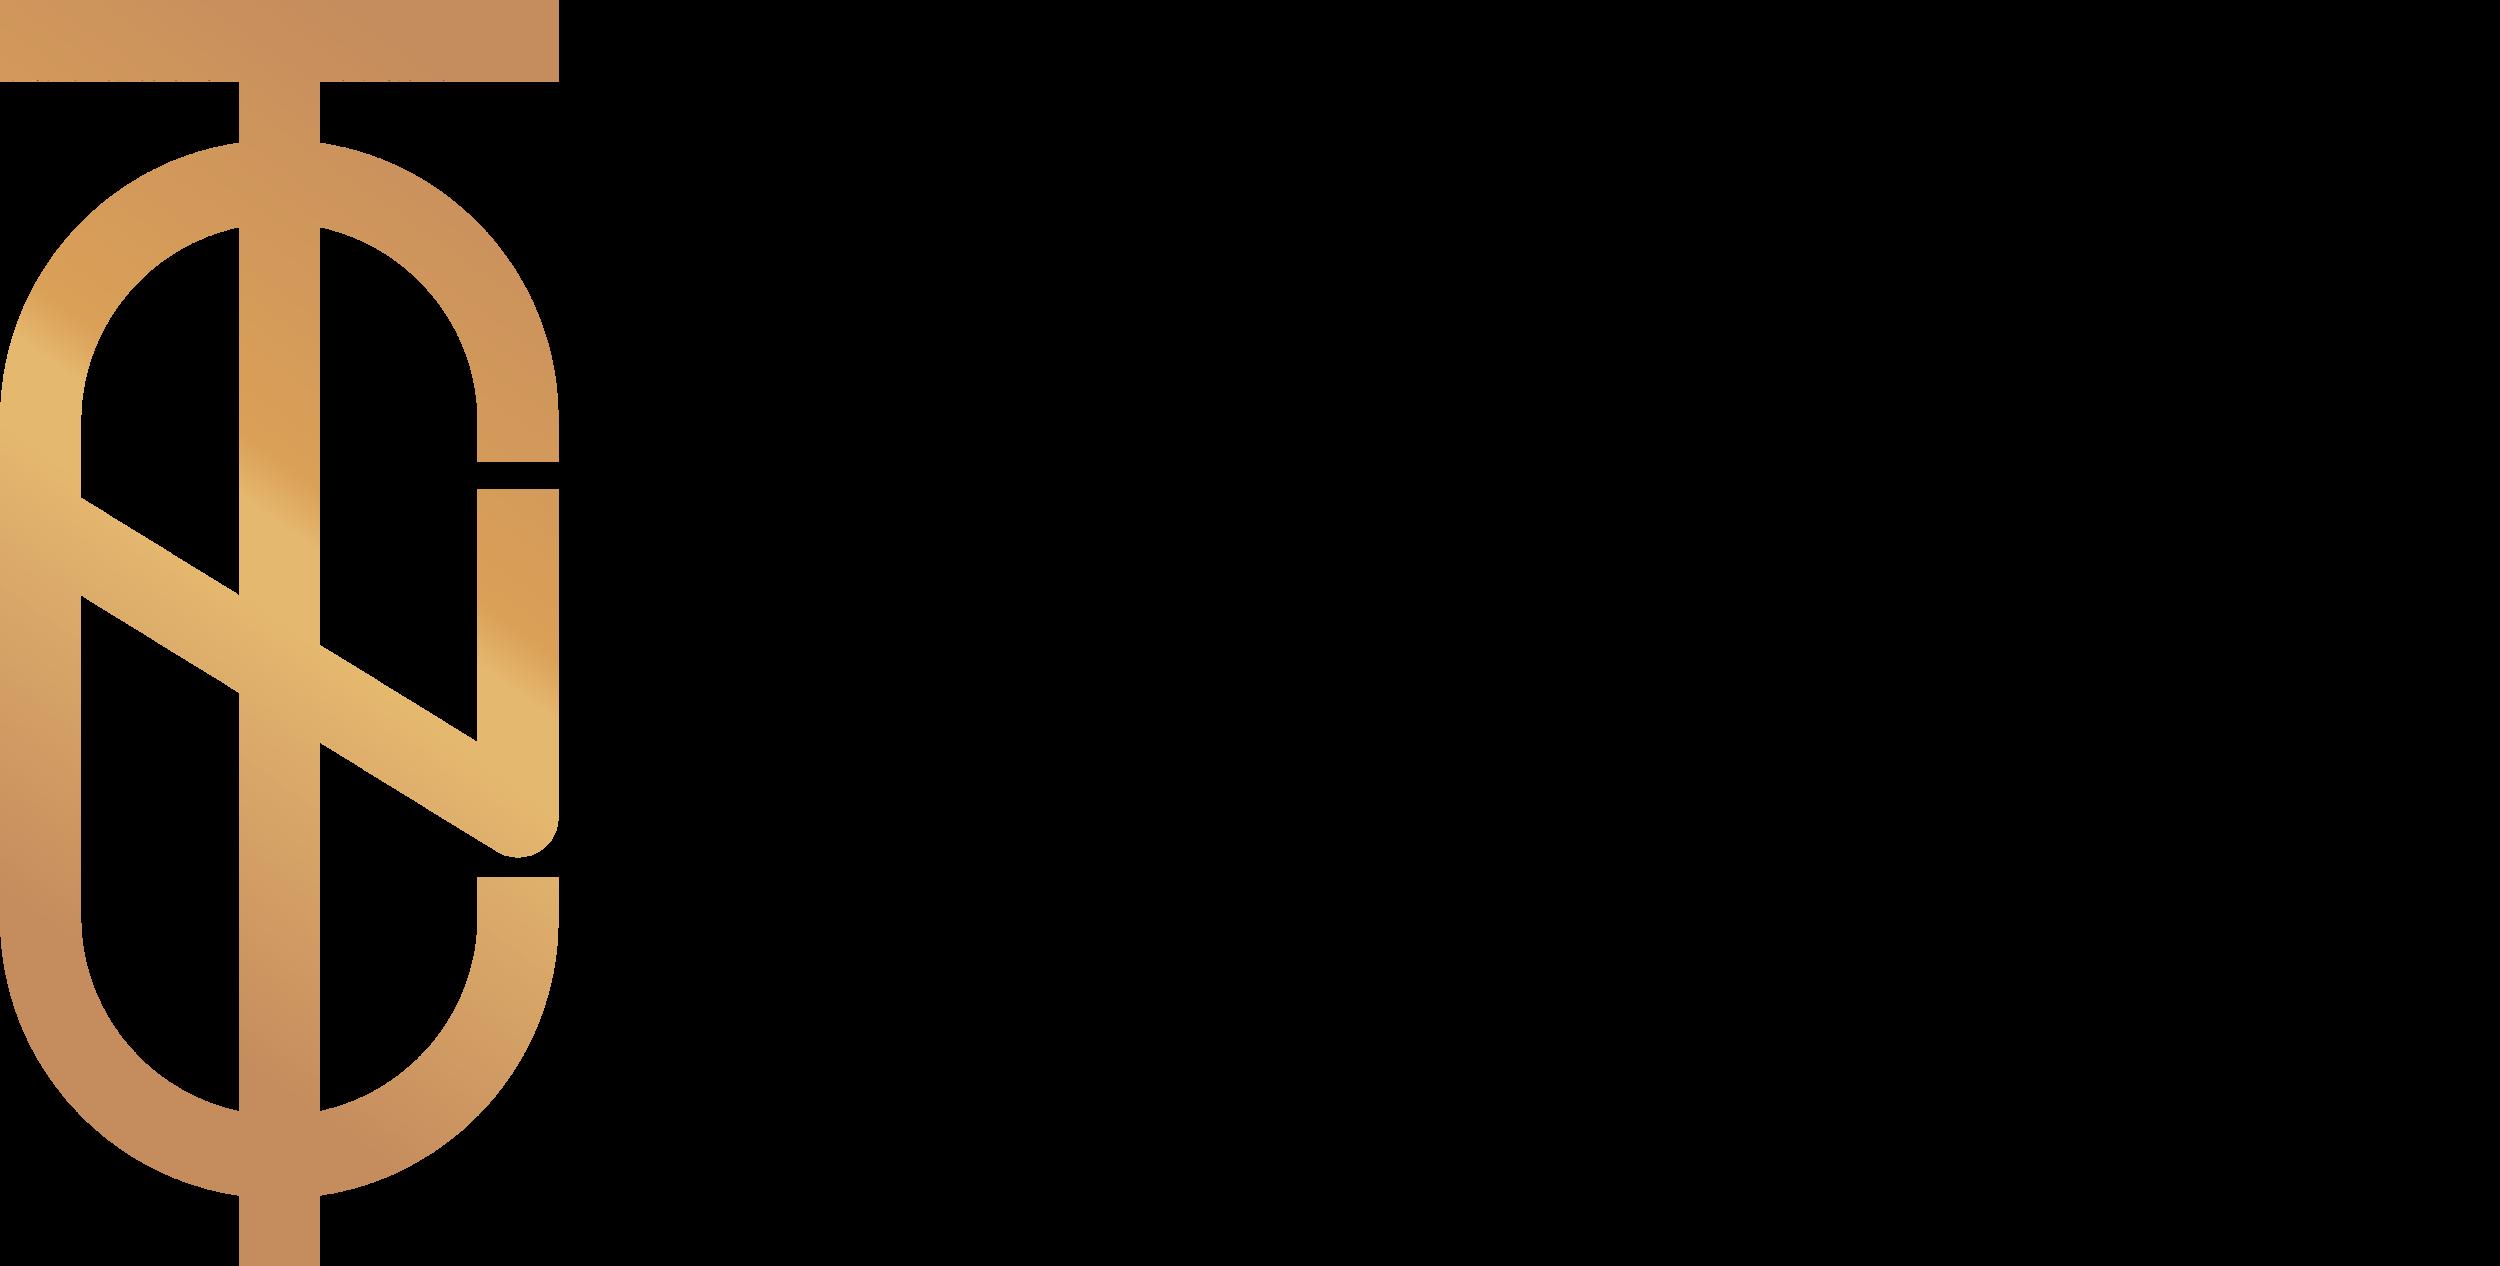 Graciejnyc_Transparency (1) (1).png